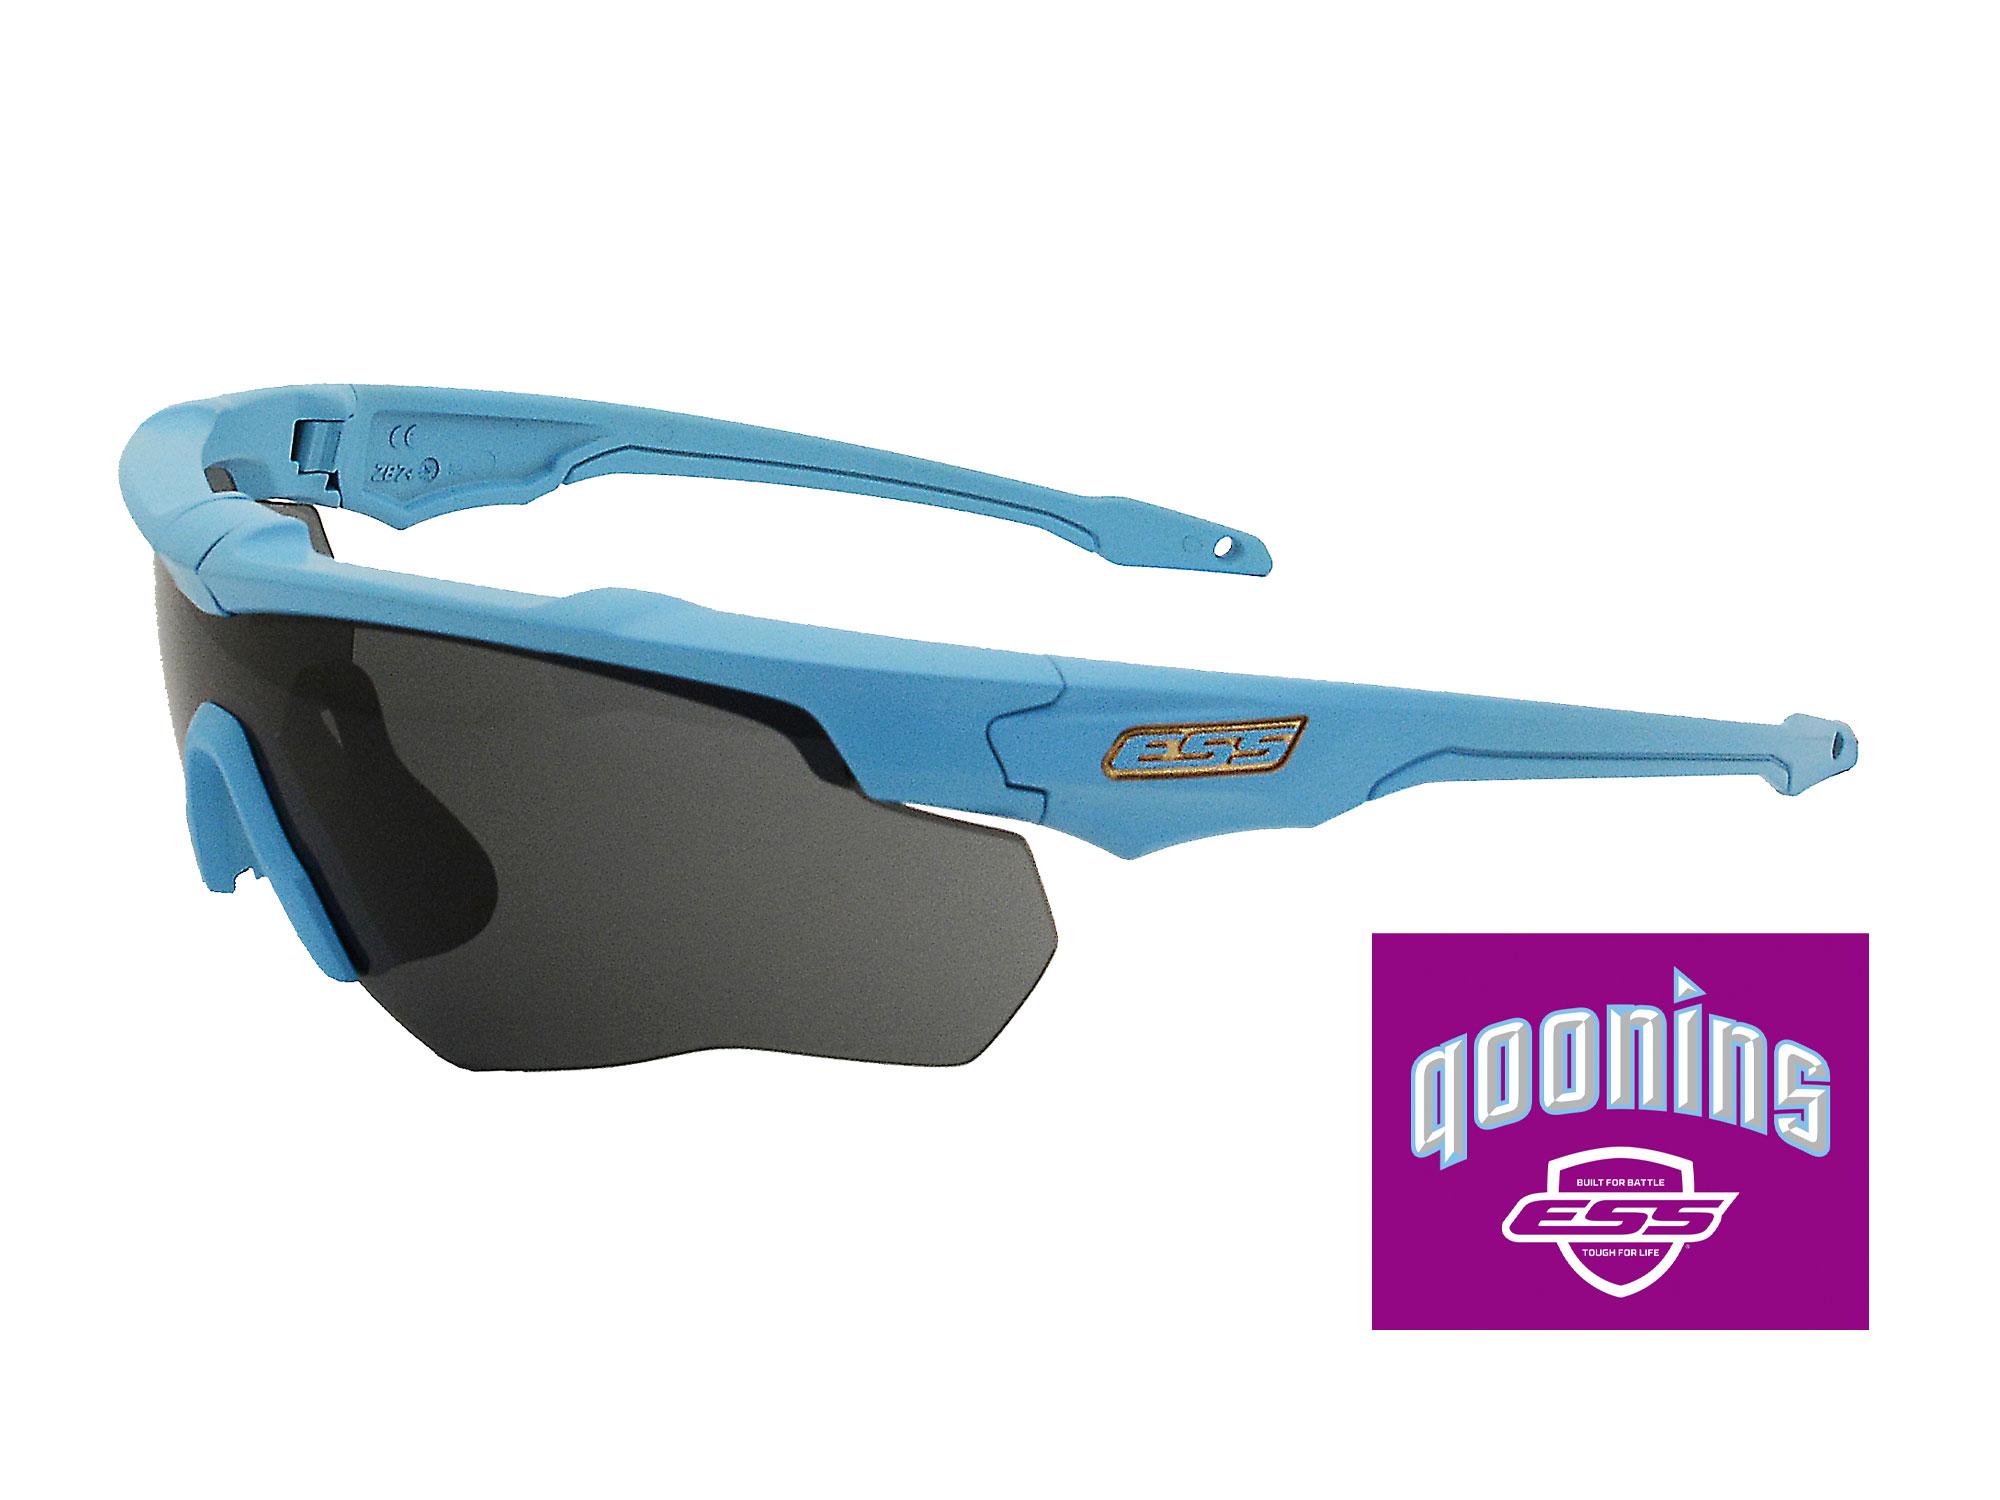 EE9032-qnsフレーム:クーニンズブルー、レンズ:スモークグレイ